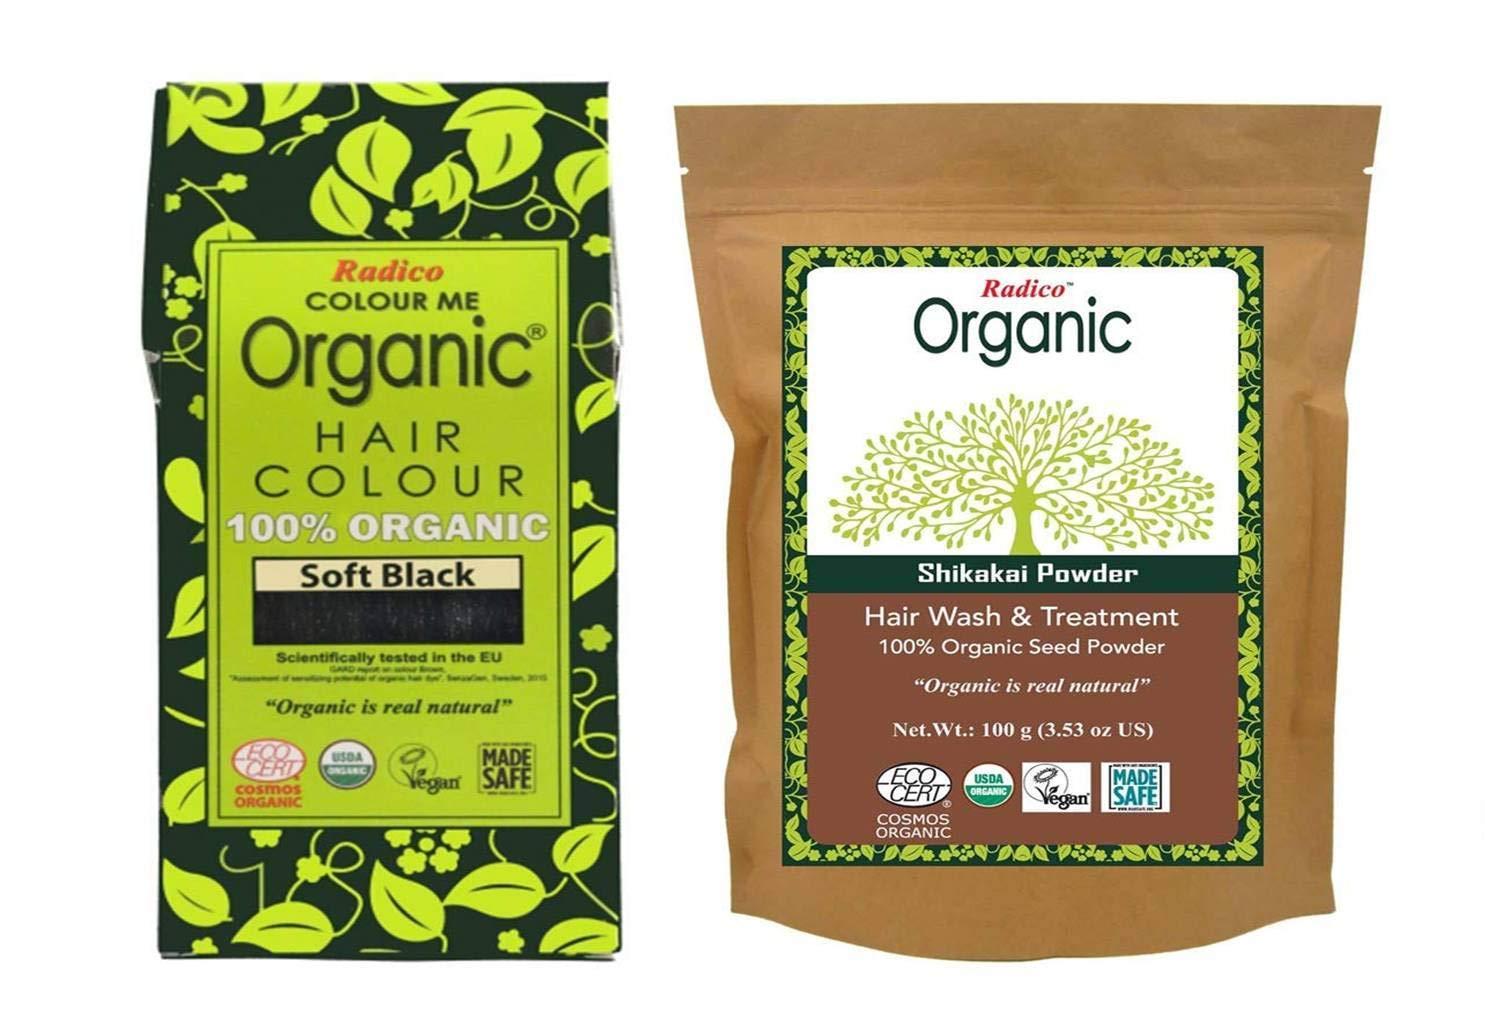 100% Organic Radico Soft Black Hair color+100% Organic Shikakai Powder